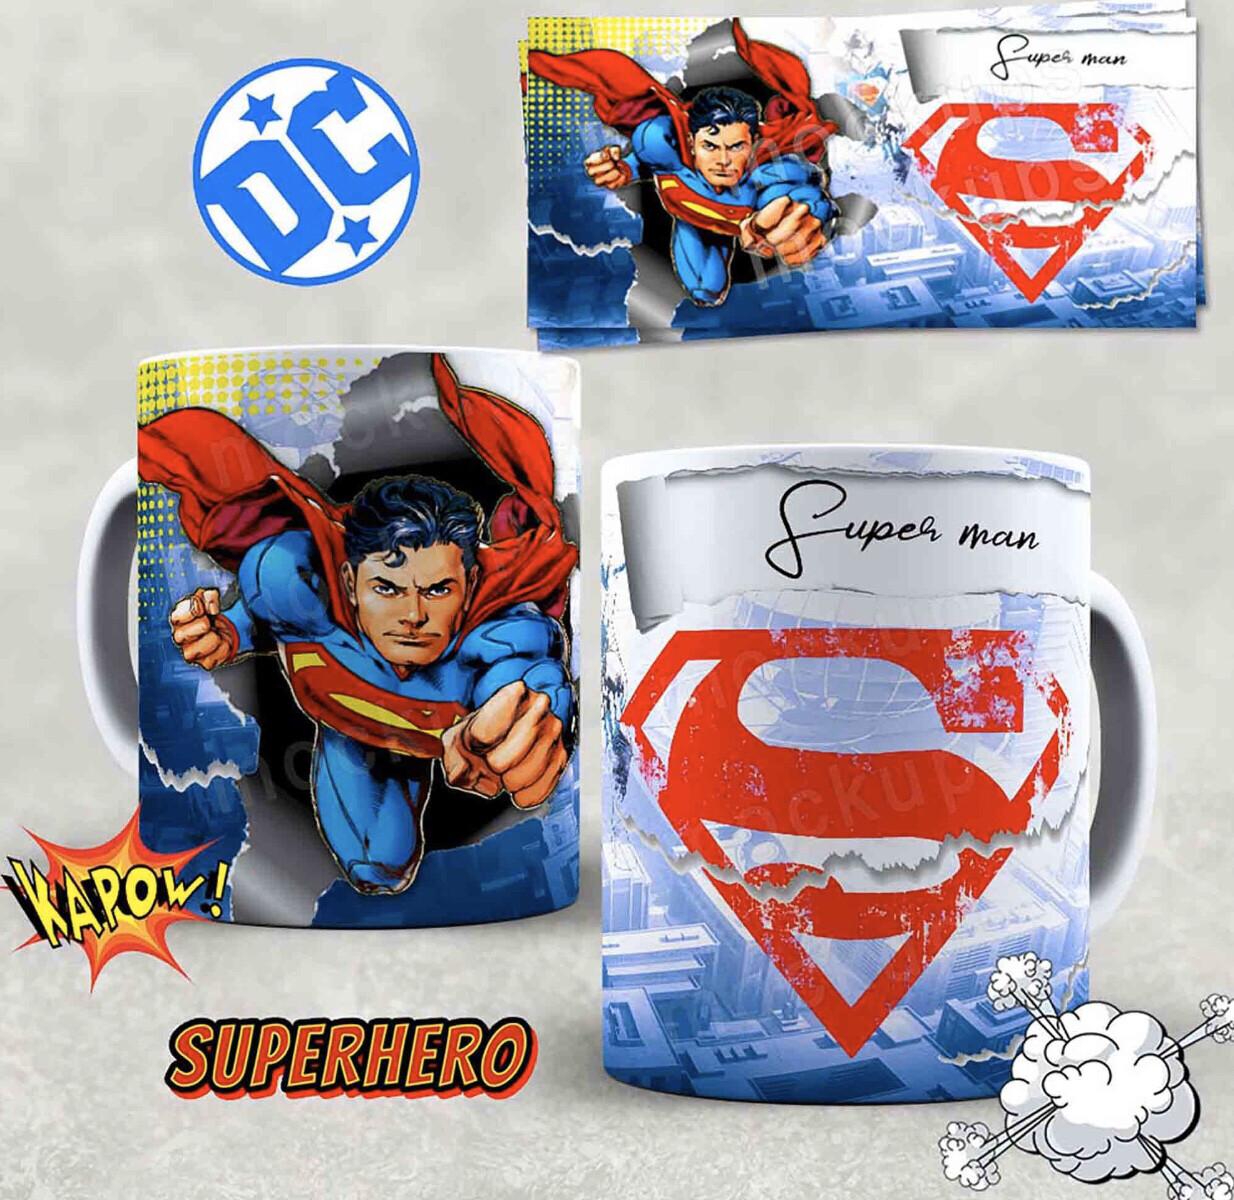 Super man Coffee mug